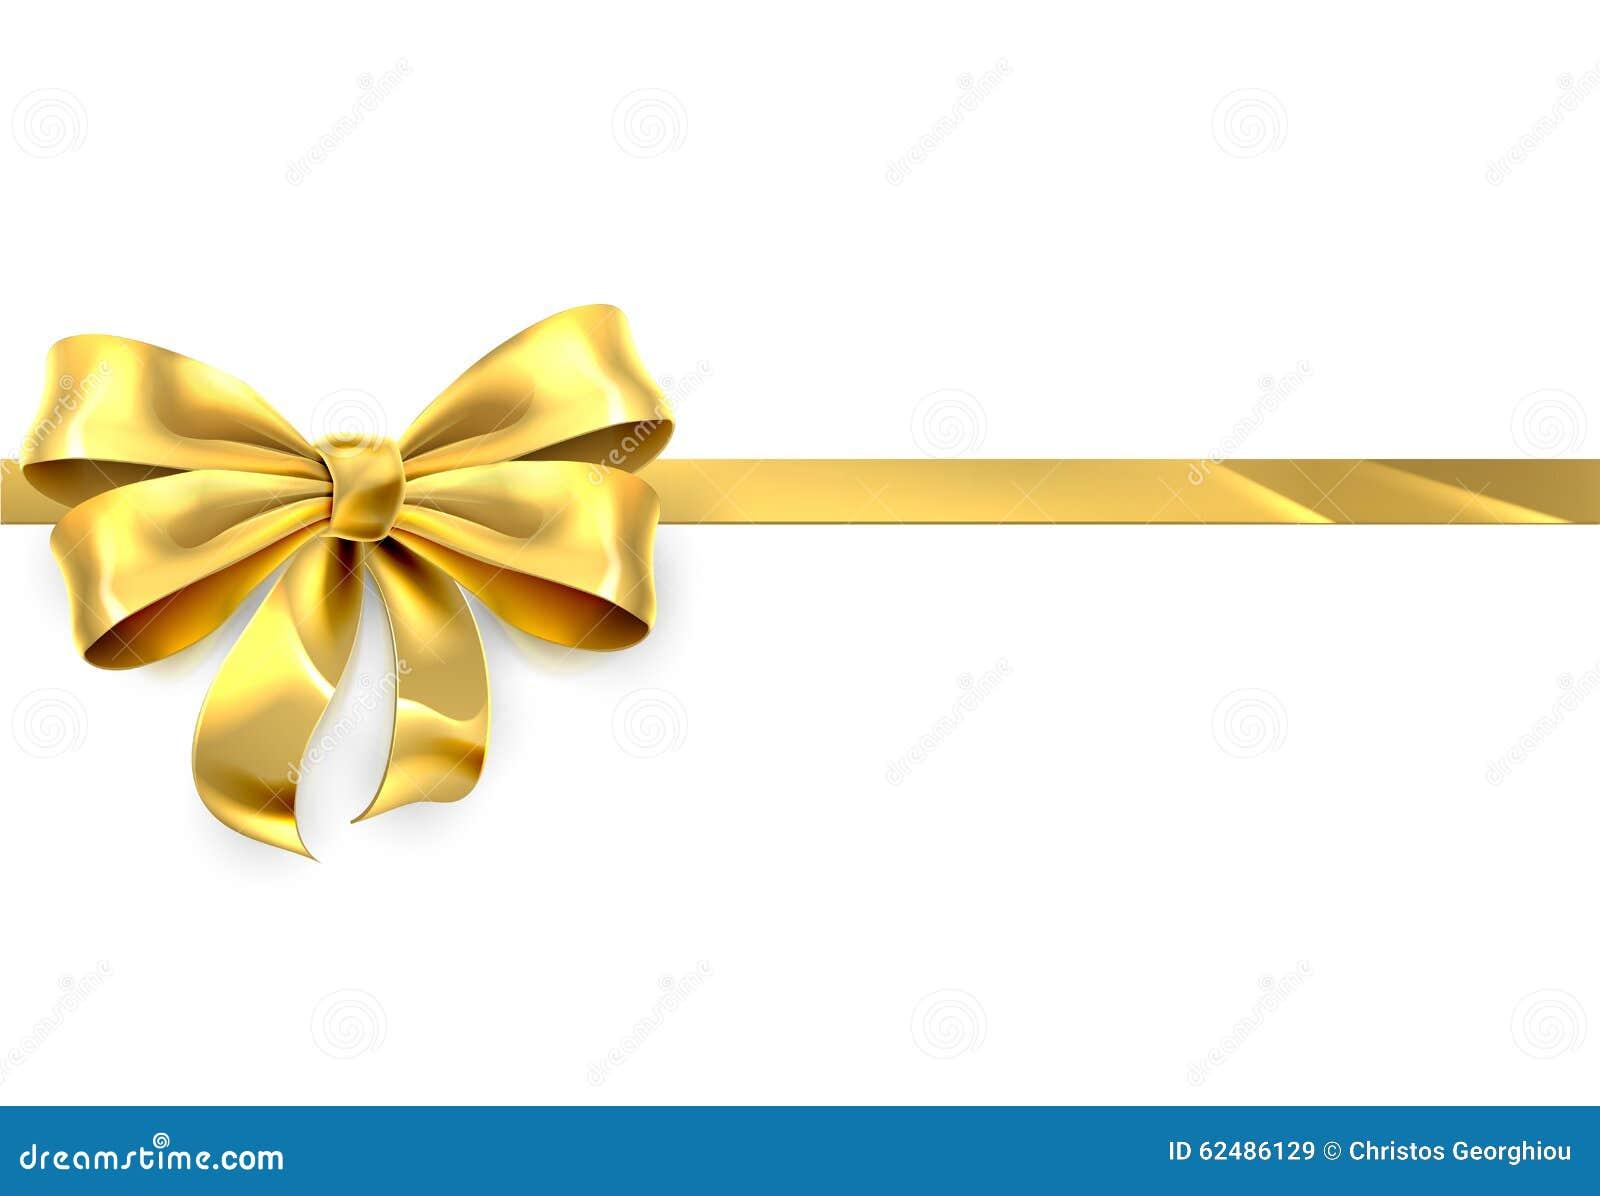 Christmas Curling Ribbon